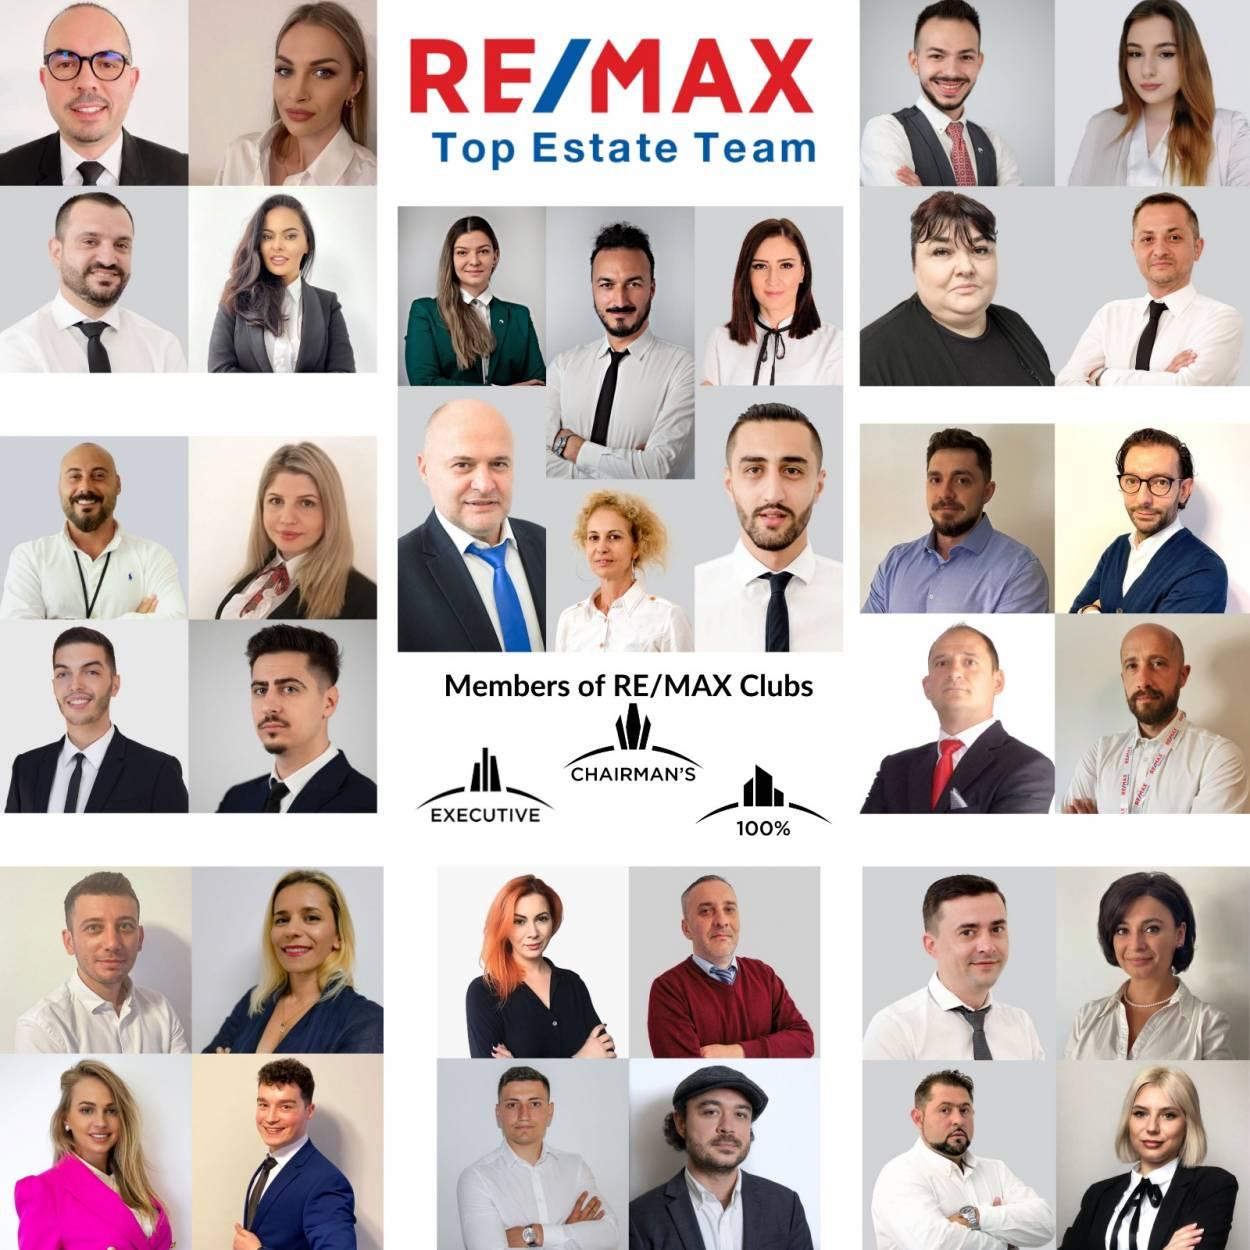 Logo - RE/MAX Top Estate Team